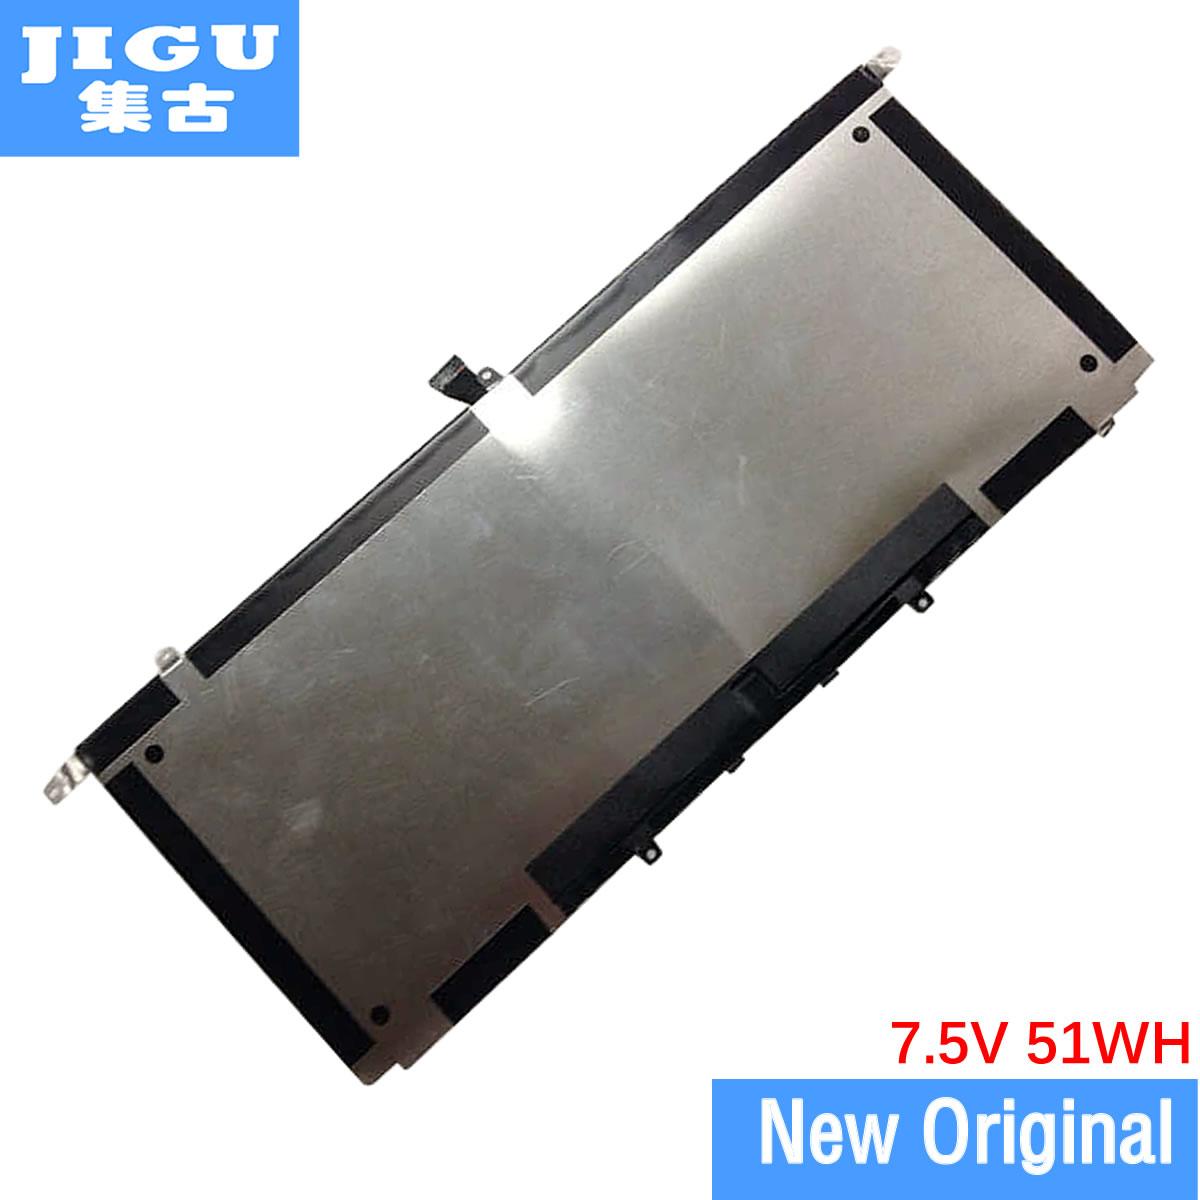 JIGU ORIGNAL laptop battery 734998-001 HSTNN-LB50 RG04051XL RG04XL TPN-F111 for HP FOR Spectre 13-3000 13-3000ed 13t-3000